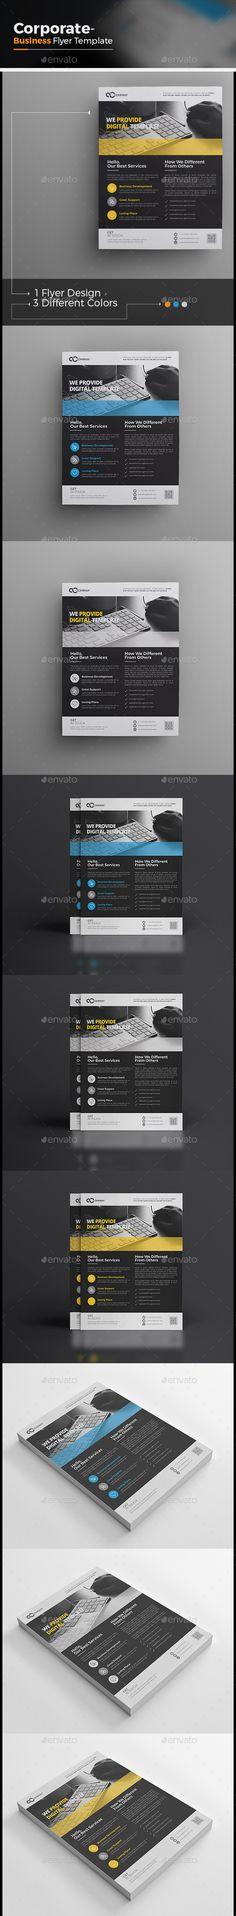 Flyer Template PSD Flyer Templates Pinterest Flyer template - sell sheet template